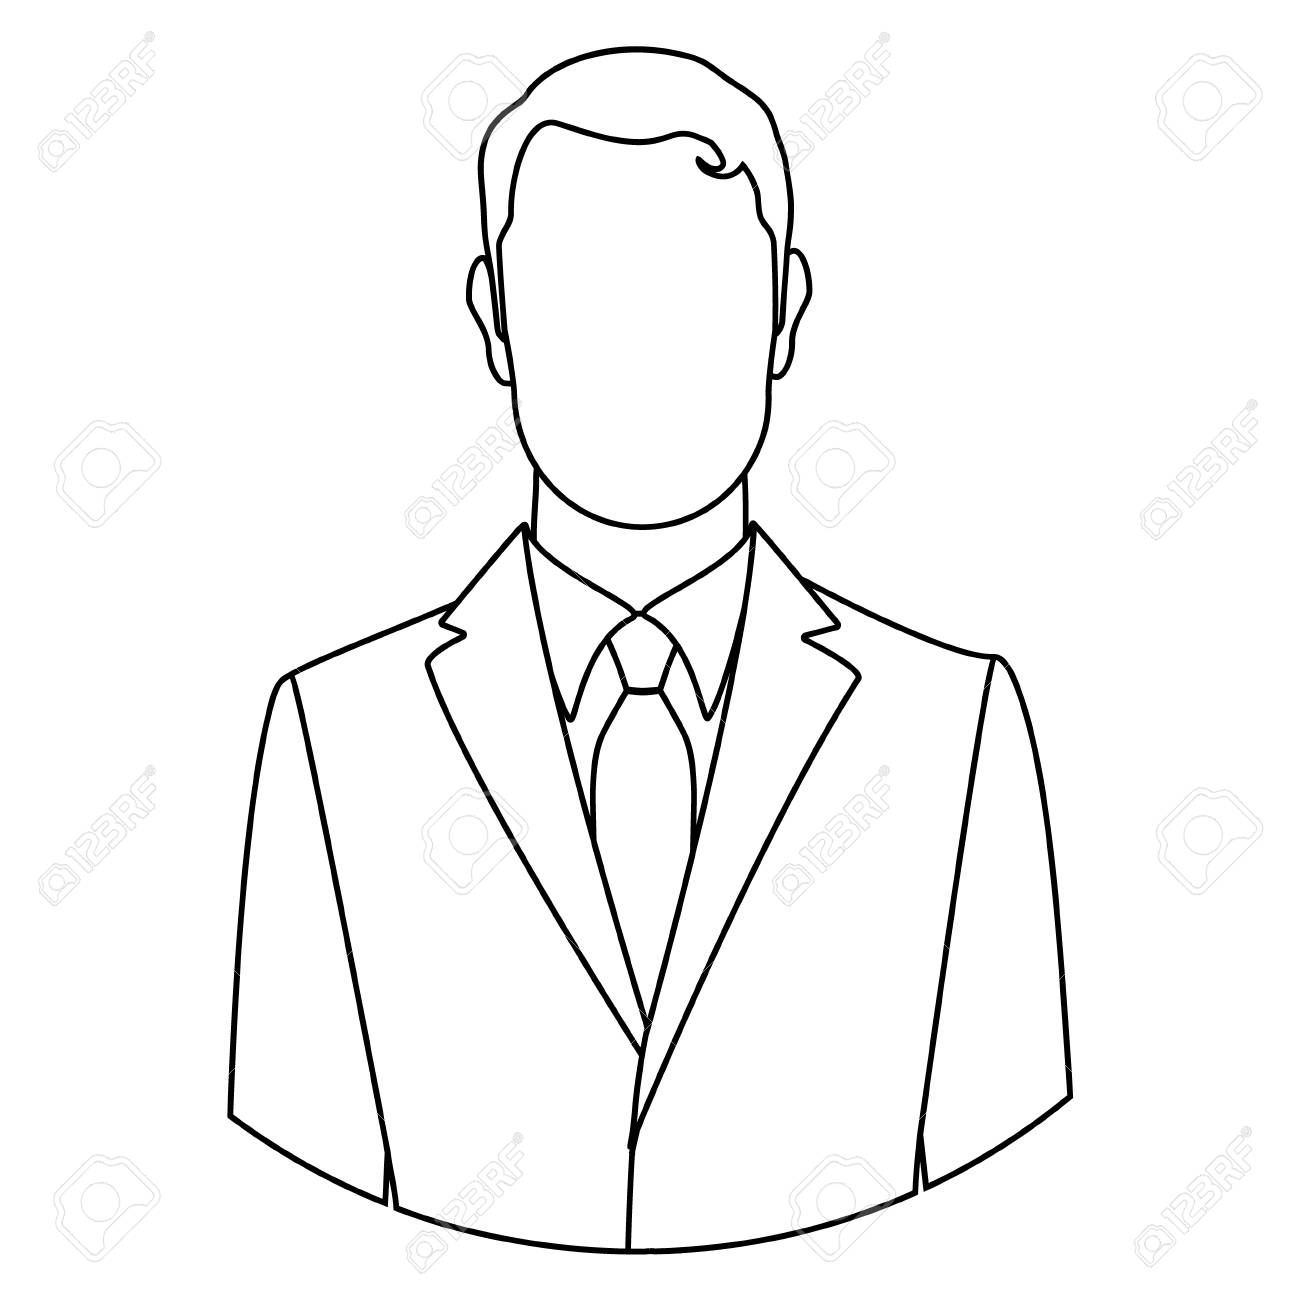 Raster illustration line businessman icon male outline drawing face avatar line art style raster